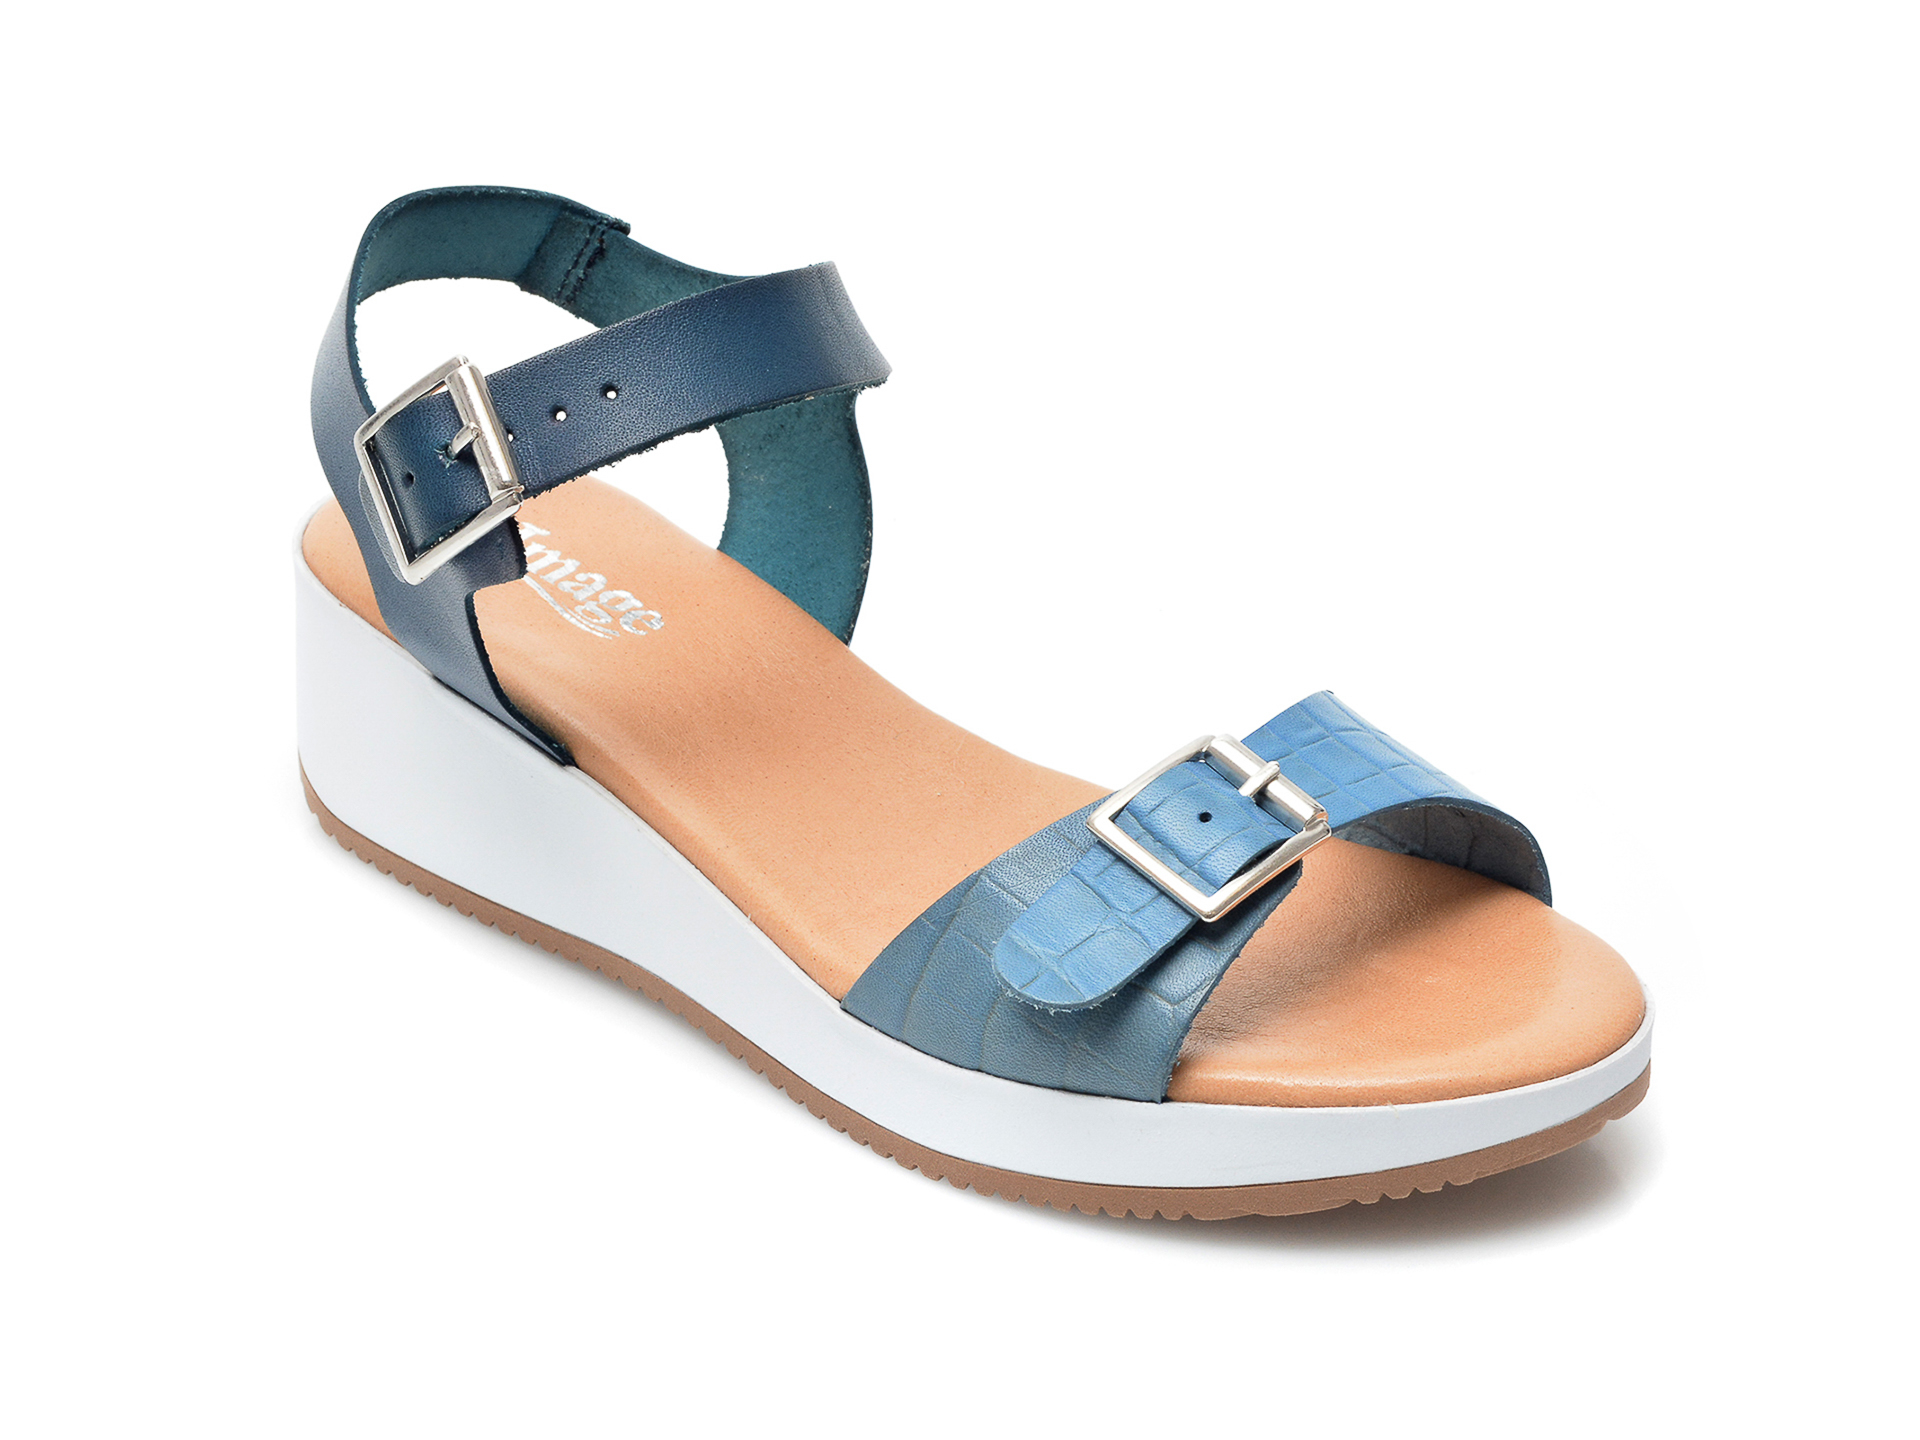 Sandale IMAGE albastre, 1411S, din piele naturala imagine otter.ro 2021